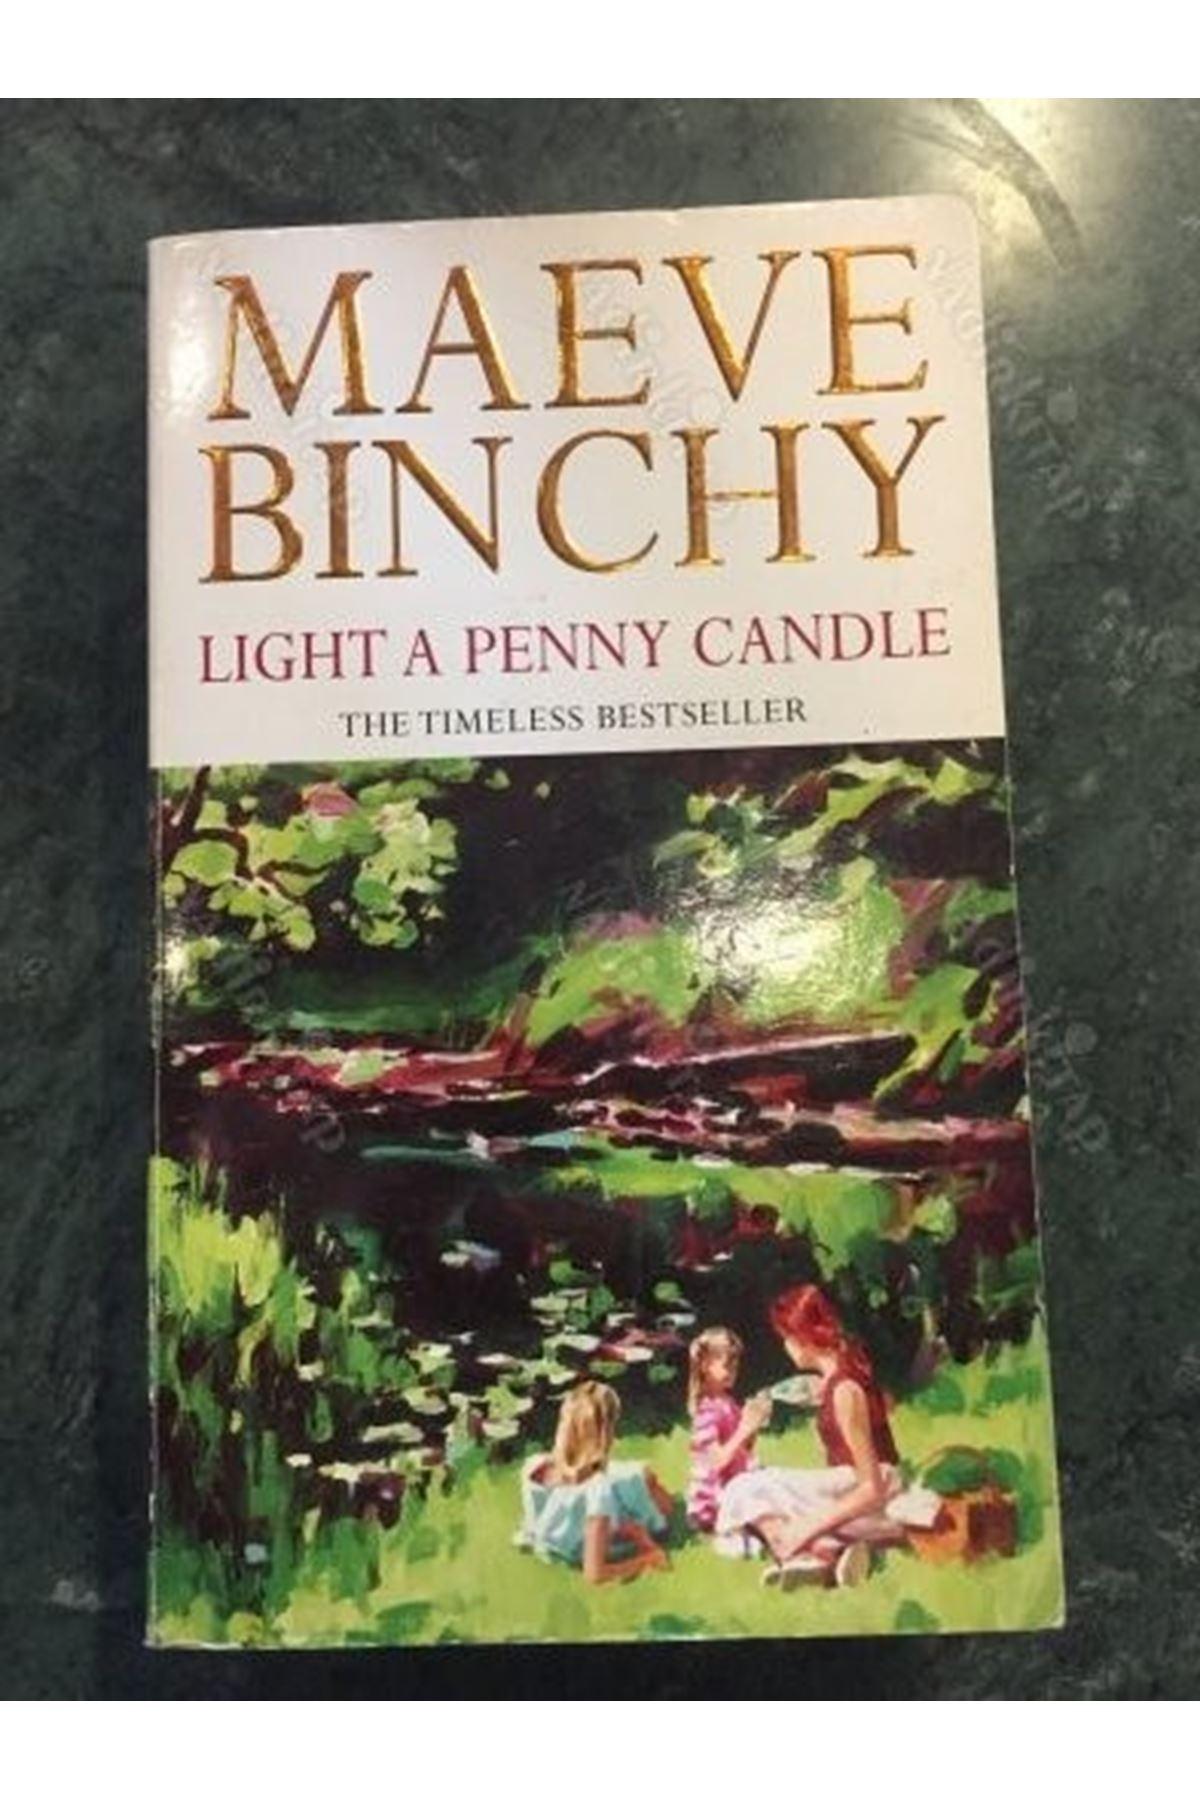 MAEVE BINCHY - LIGHT A PENNY CANDLE